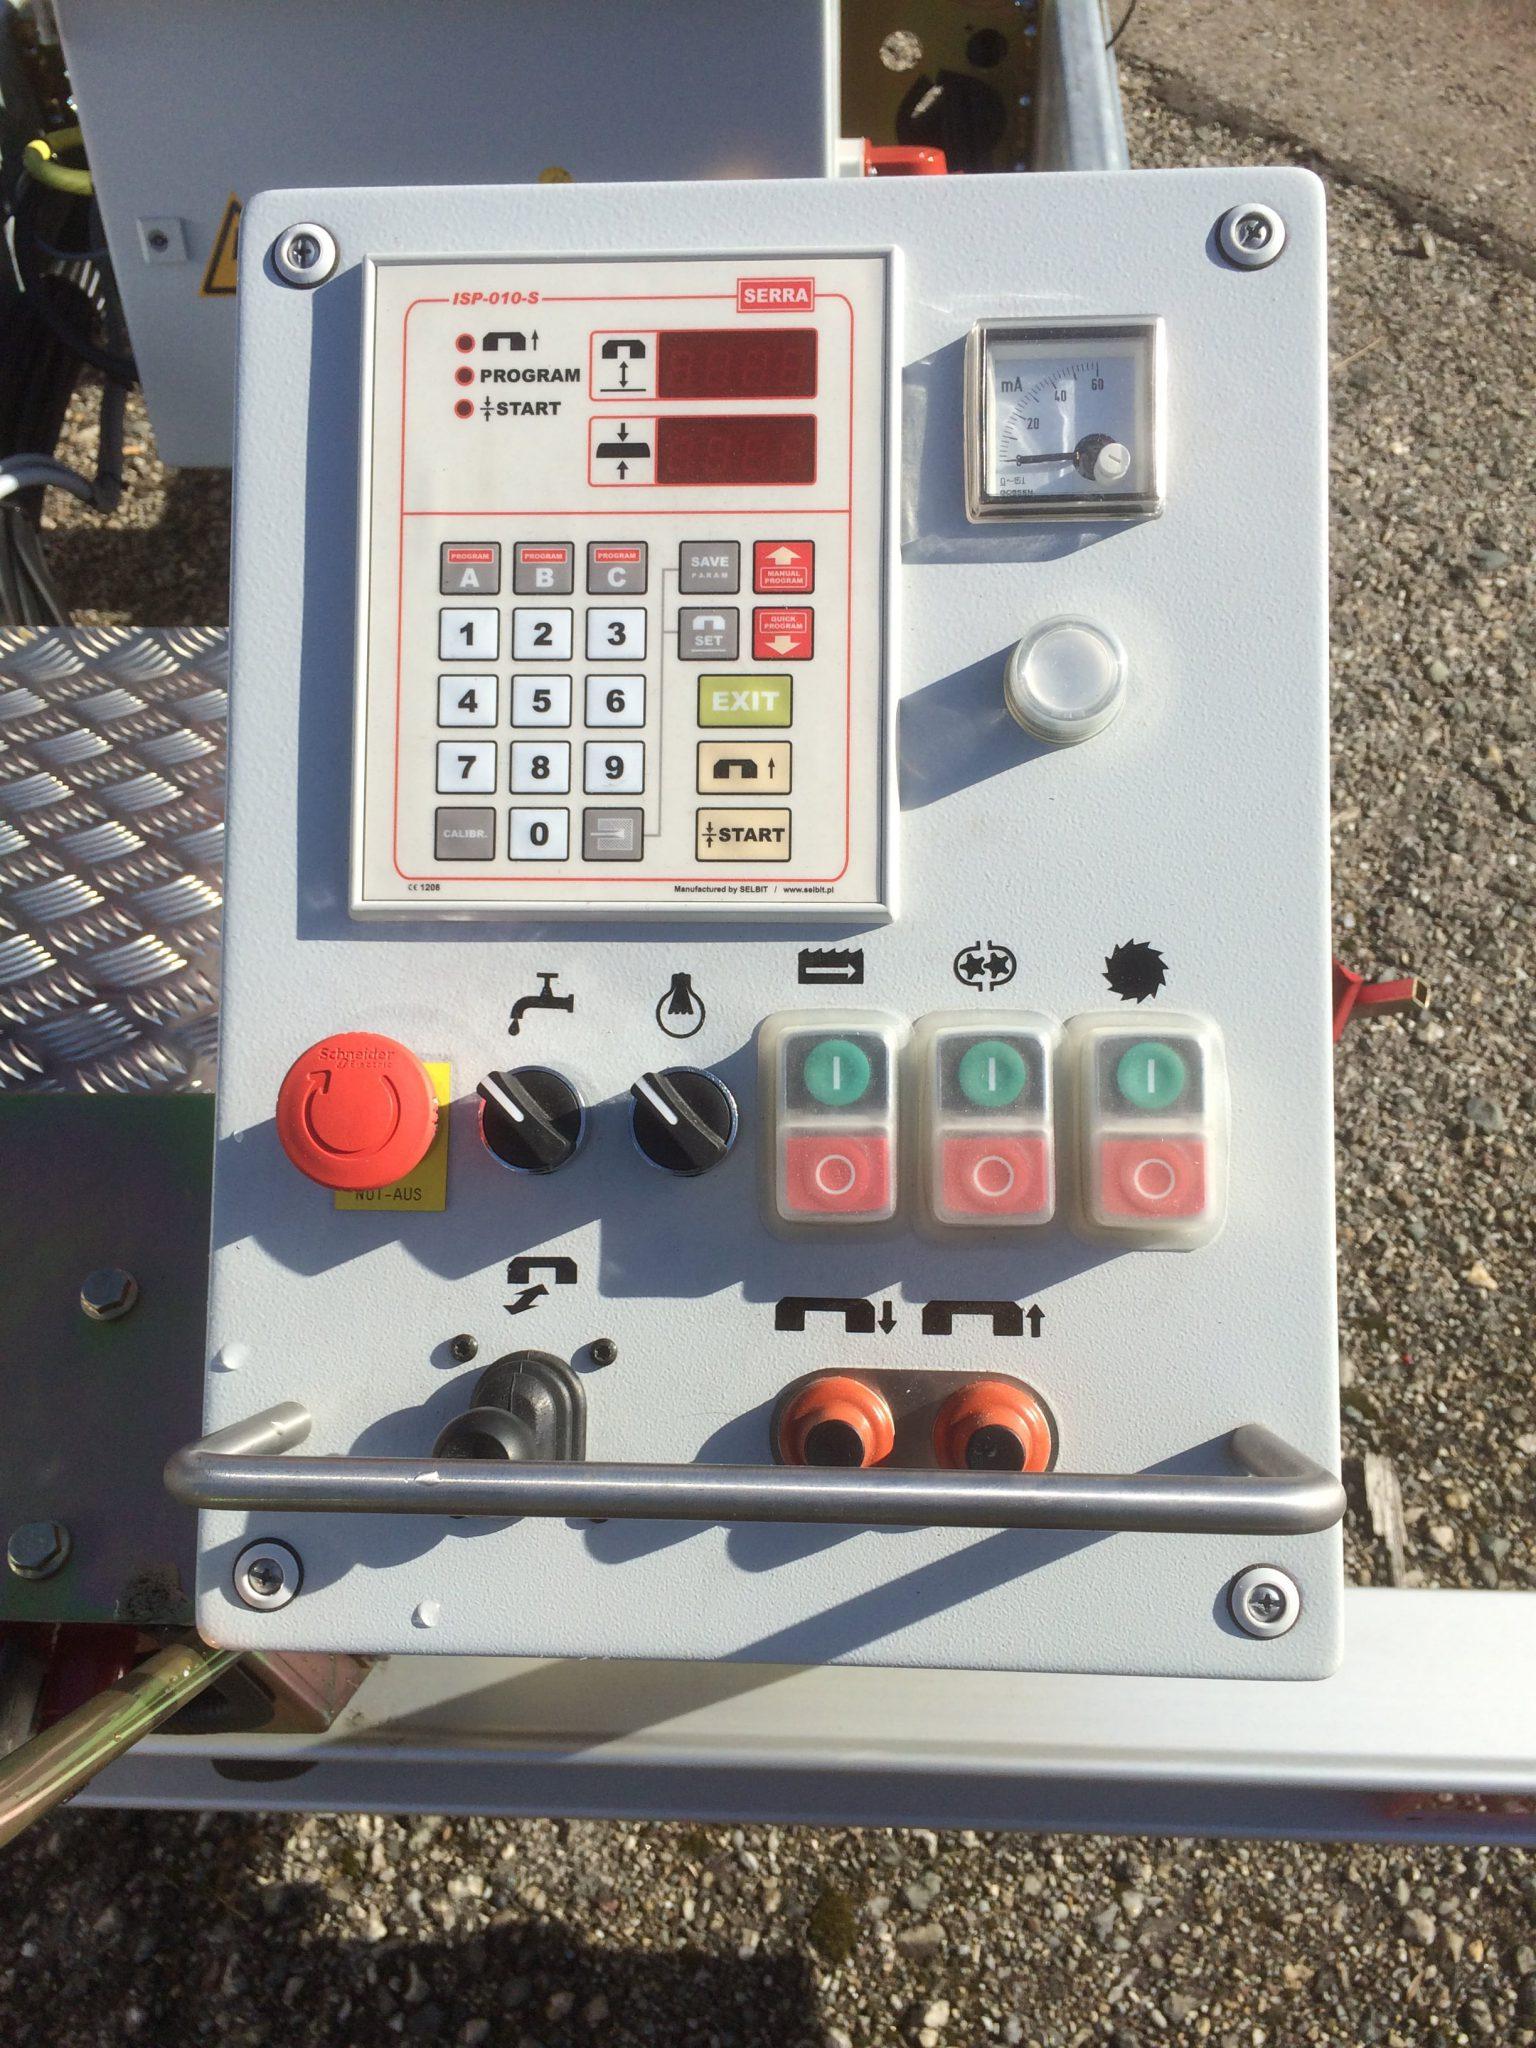 SERRA-POSI-Basic Computerized controls